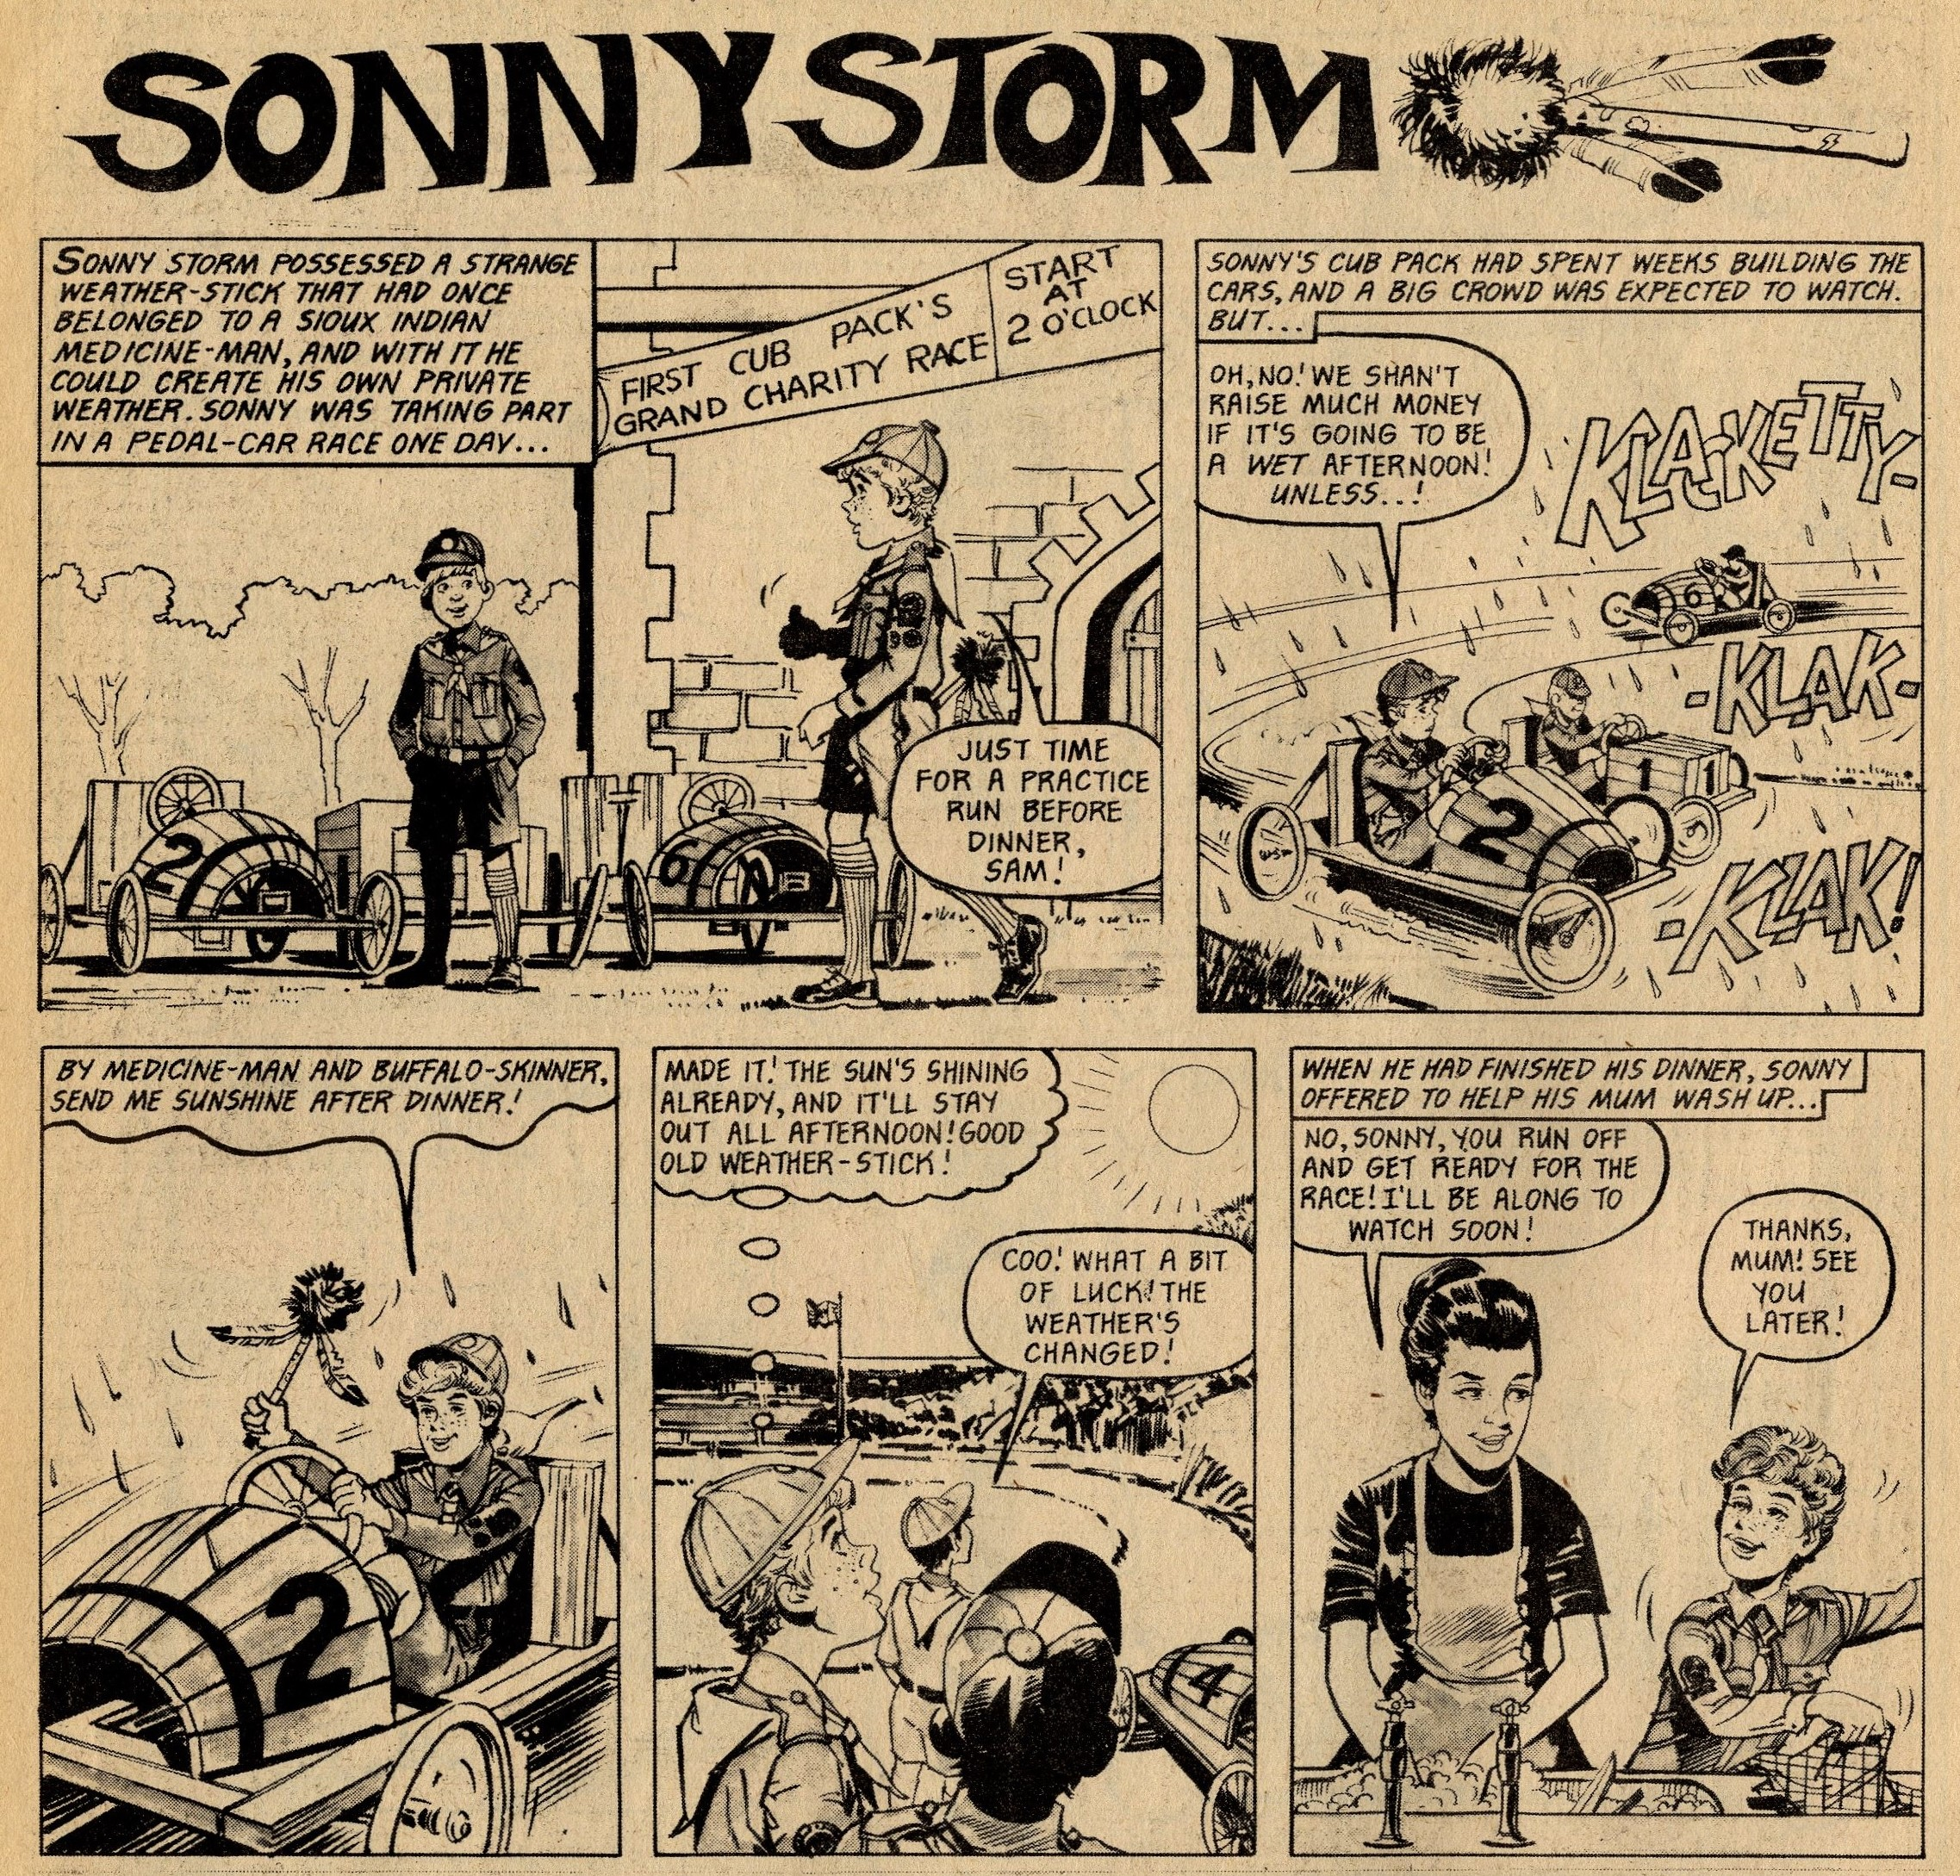 Sonny Storm: artist?